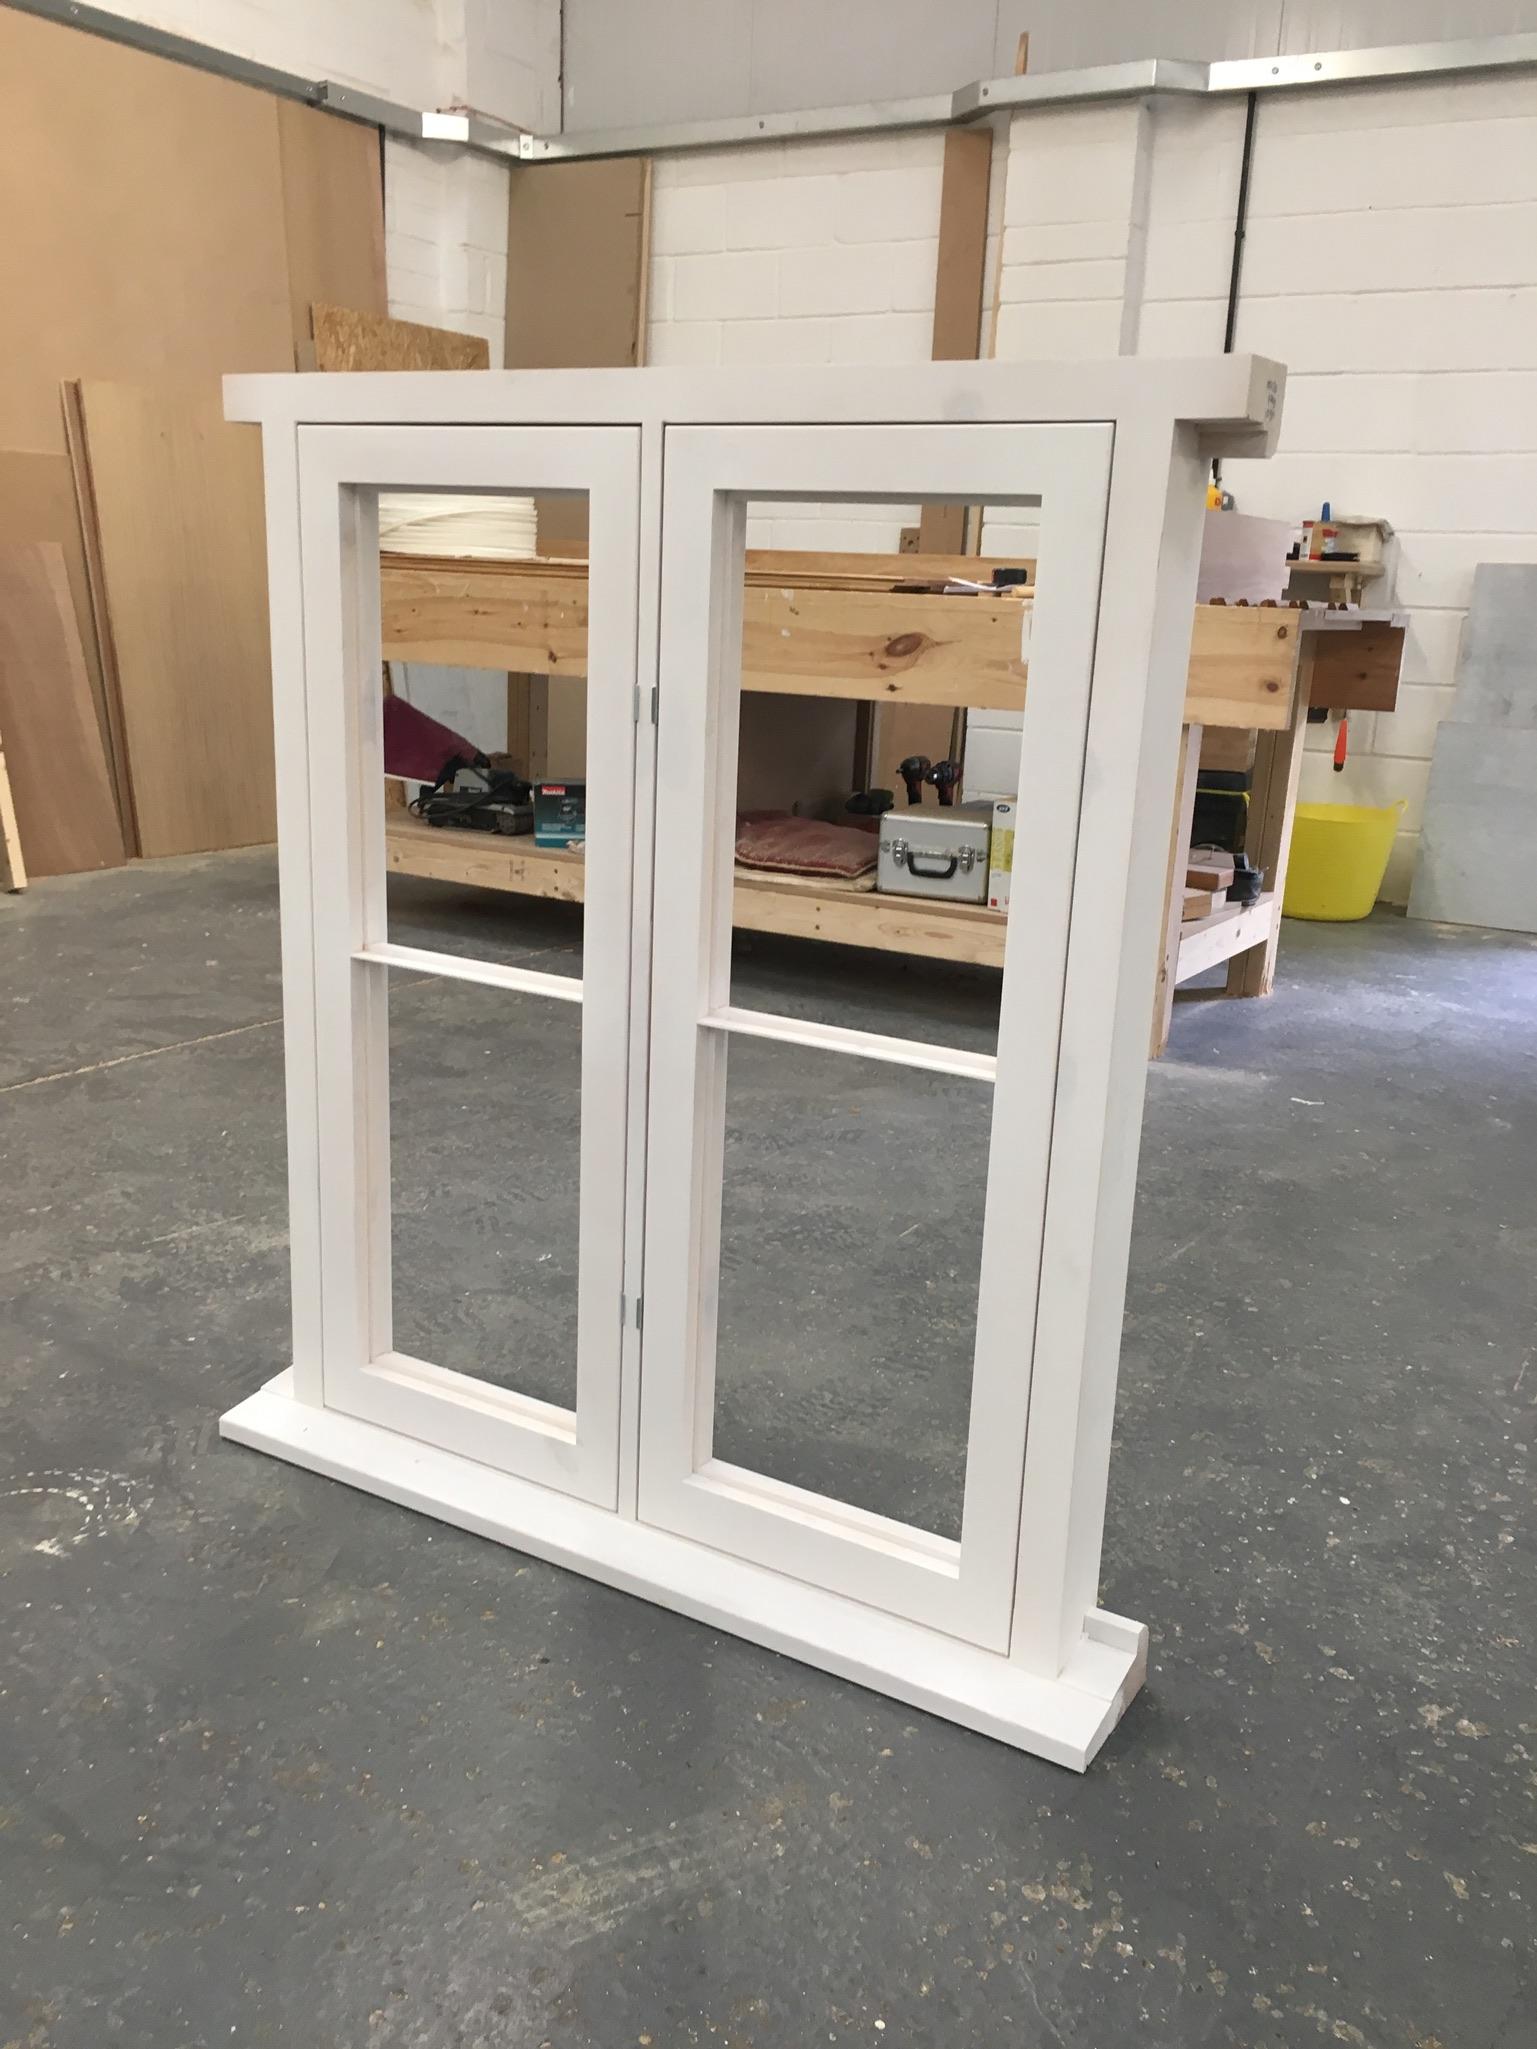 Window bespoke design and build sudbury suffolk east anglia for Window upper design